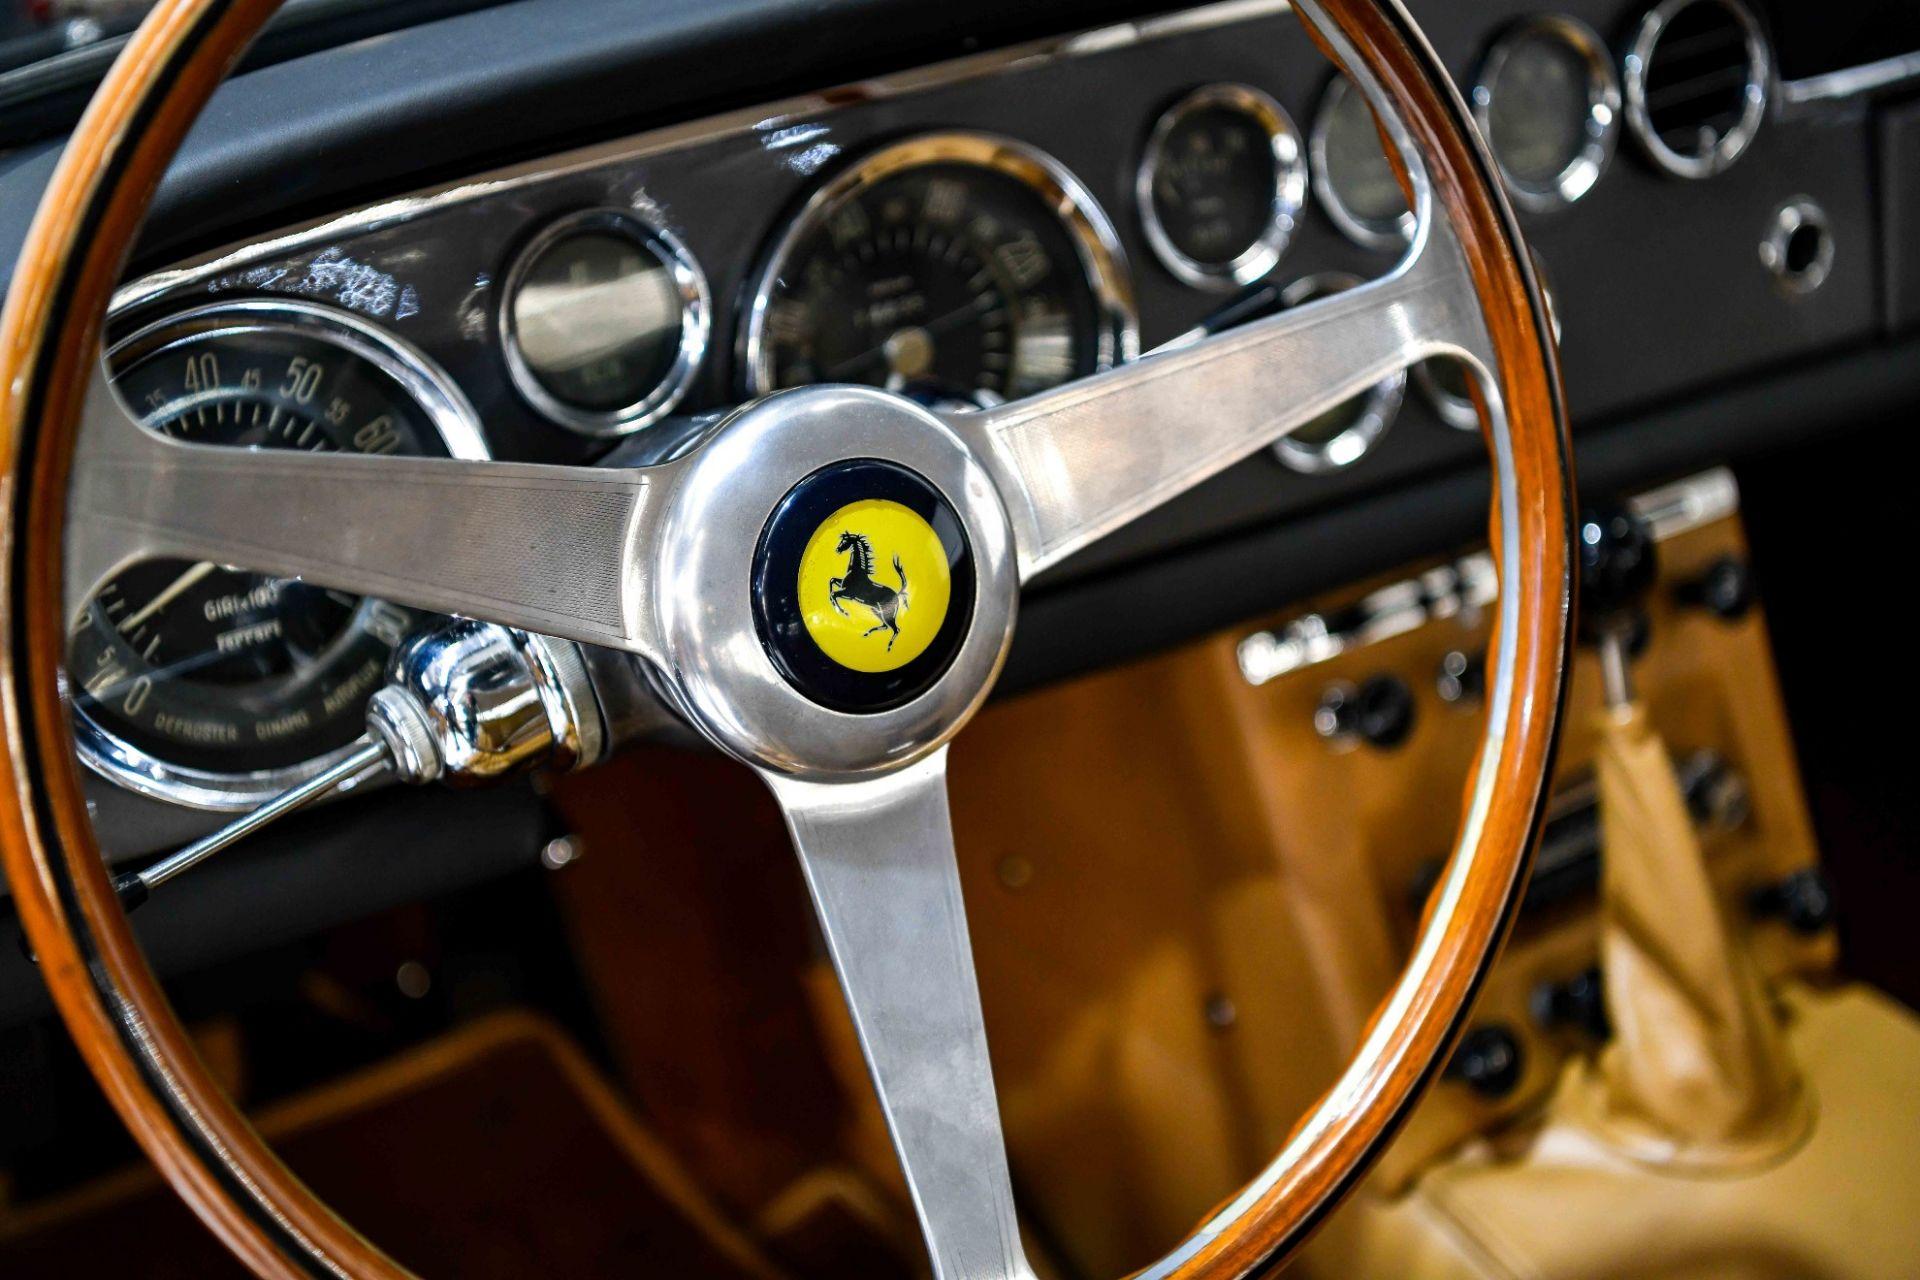 Ferrari 250 GTE V12 1962